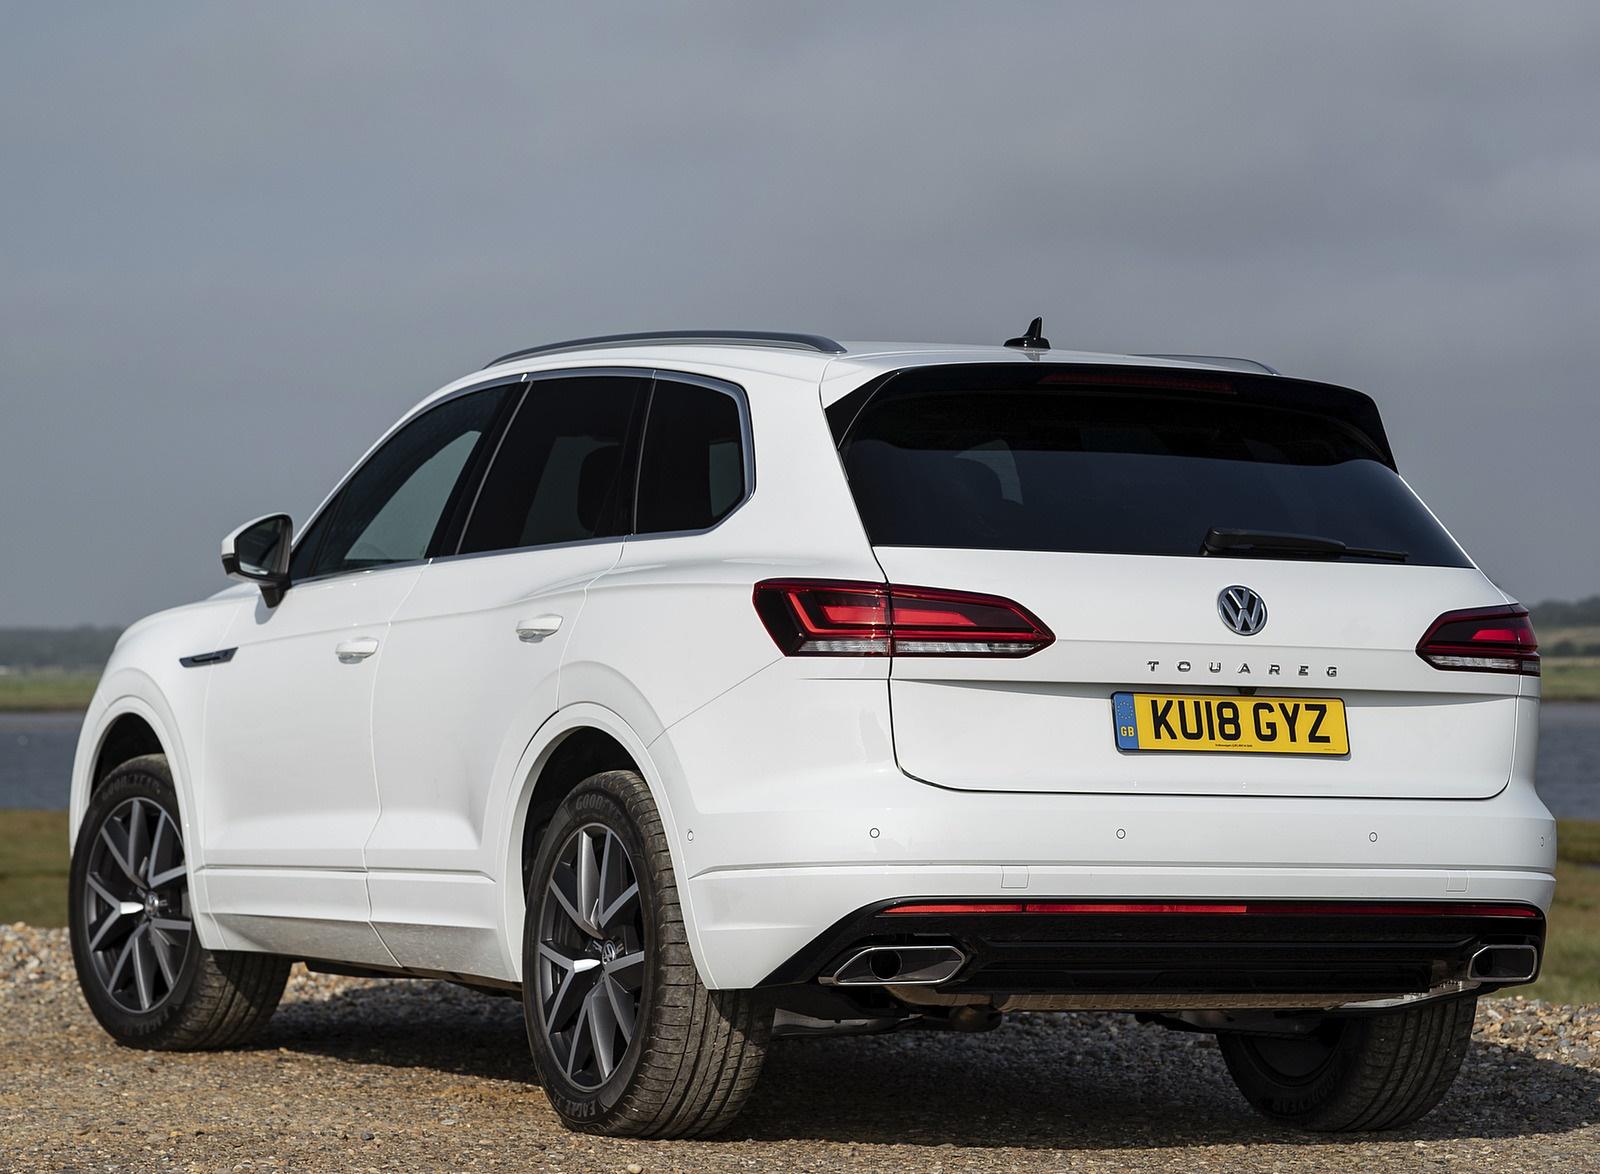 2019 Volkswagen Touareg V6 TDI R-Line (UK-Spec) Rear Three-Quarter Wallpapers #16 of 43